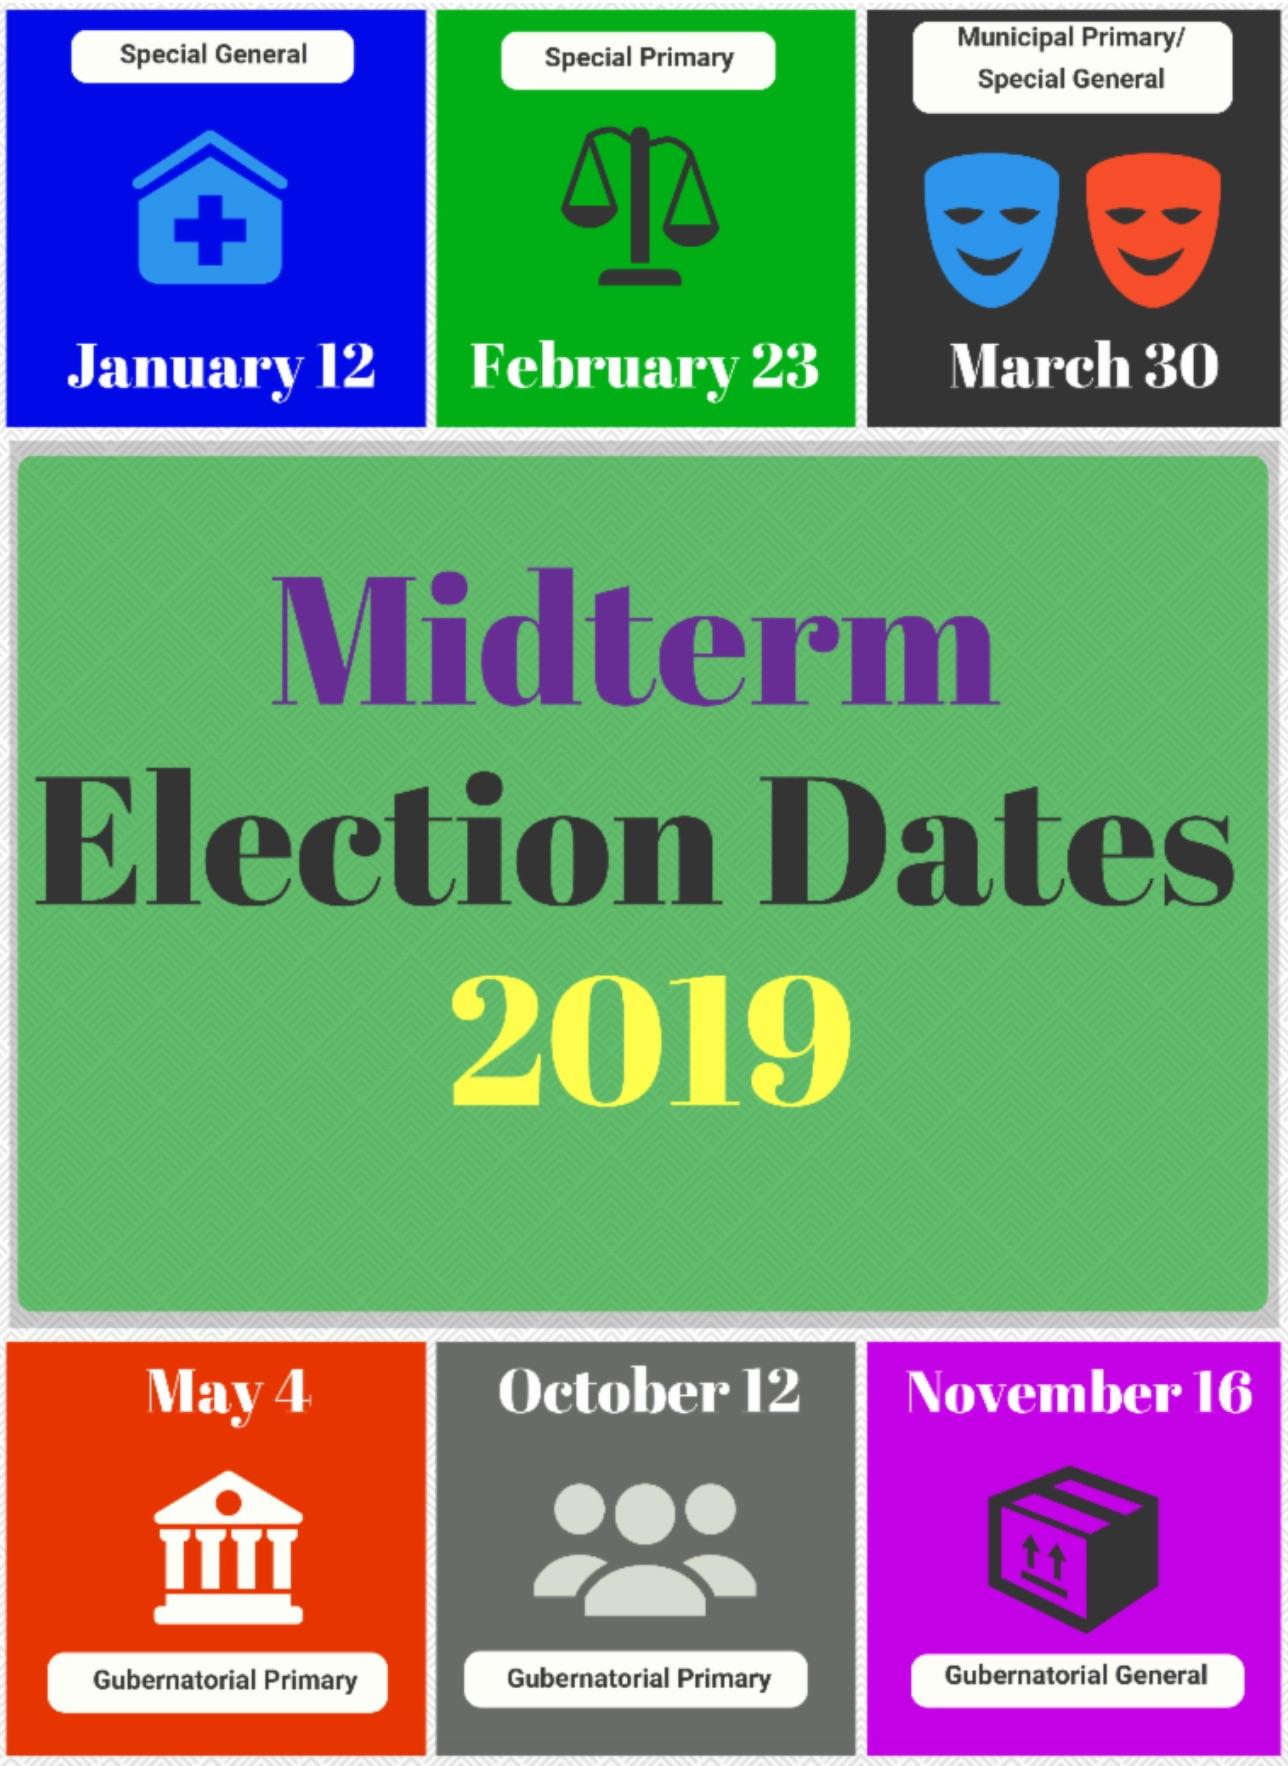 Midterm Election Dates, 2019